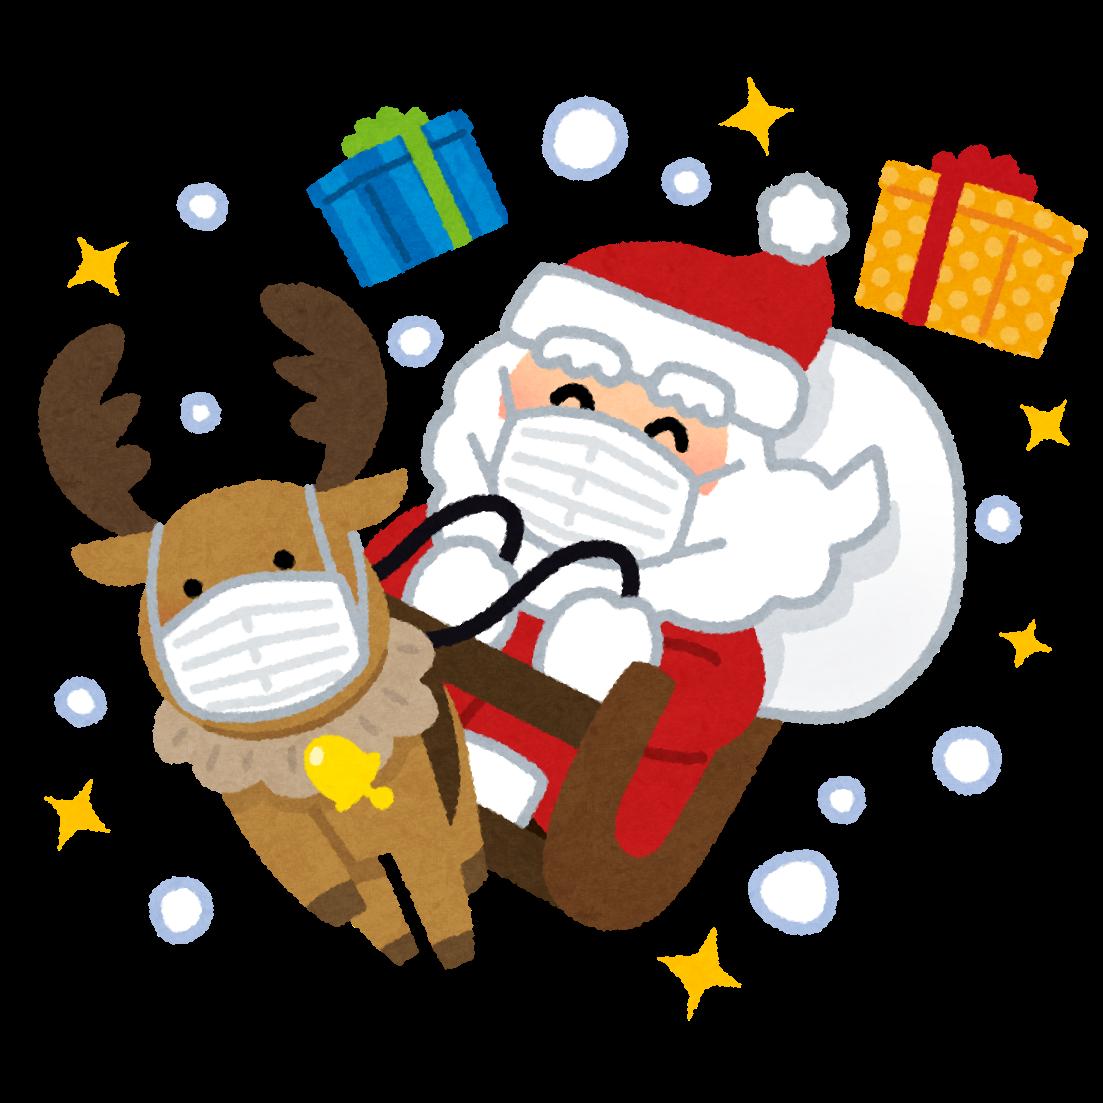 christmas_mask_santa_tonakai_smile.png (1103×1103)